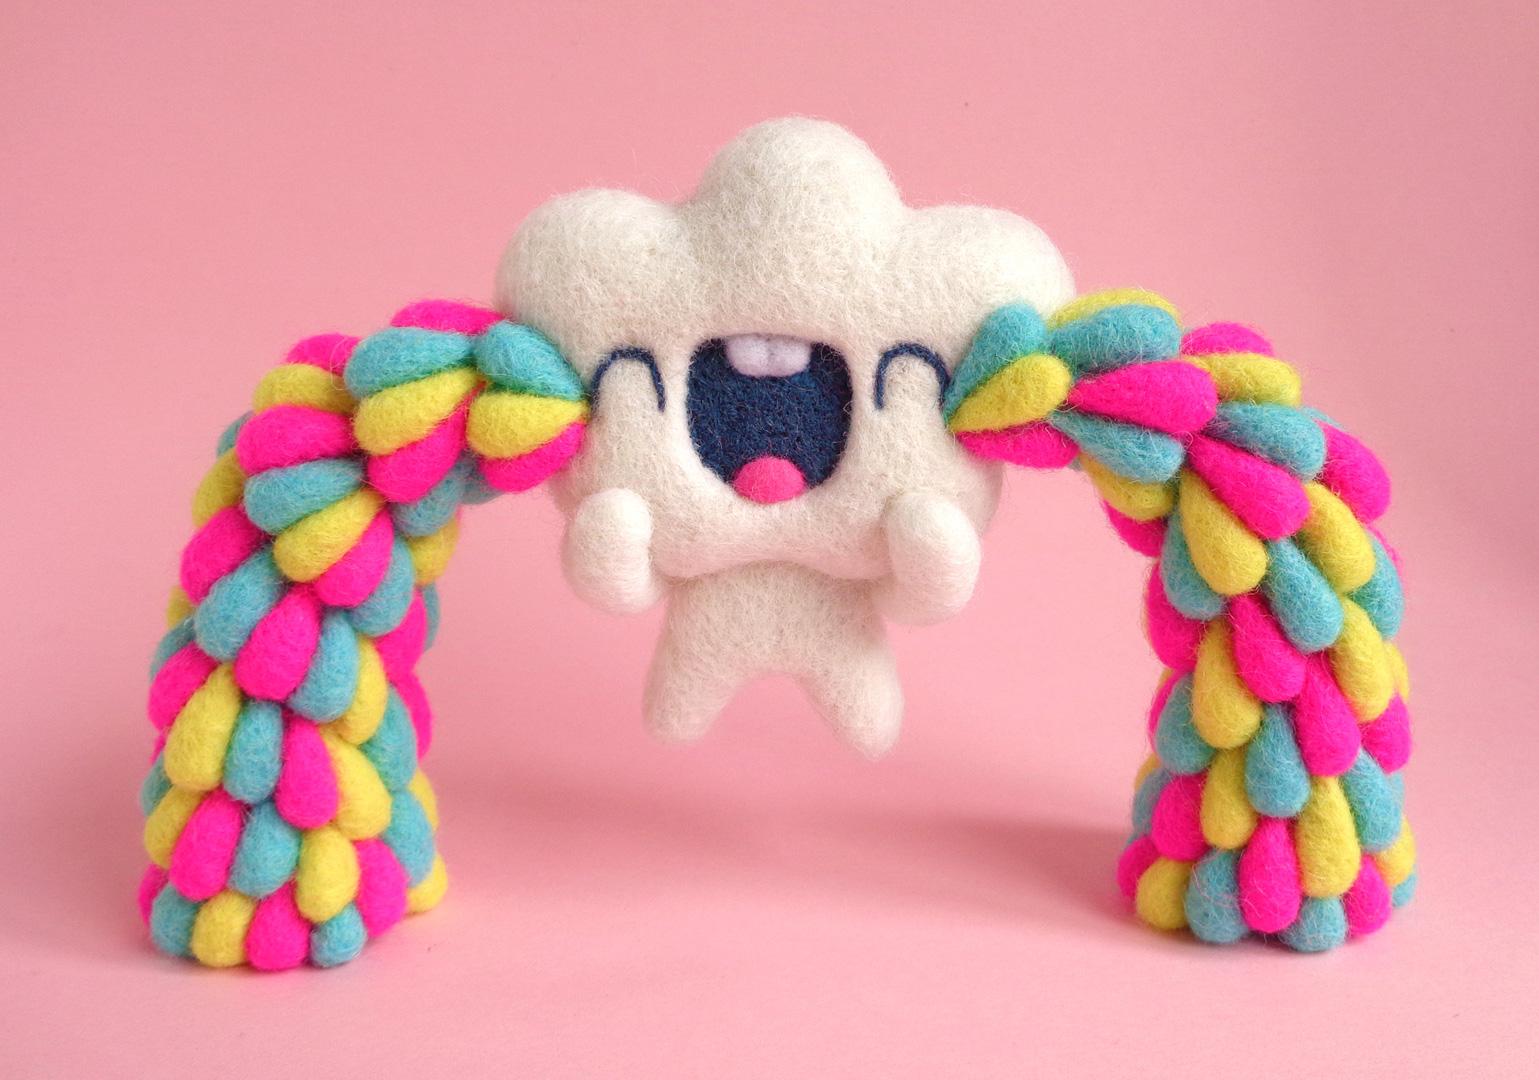 Pictoplasma 2020 - Toy Artist Droolwool